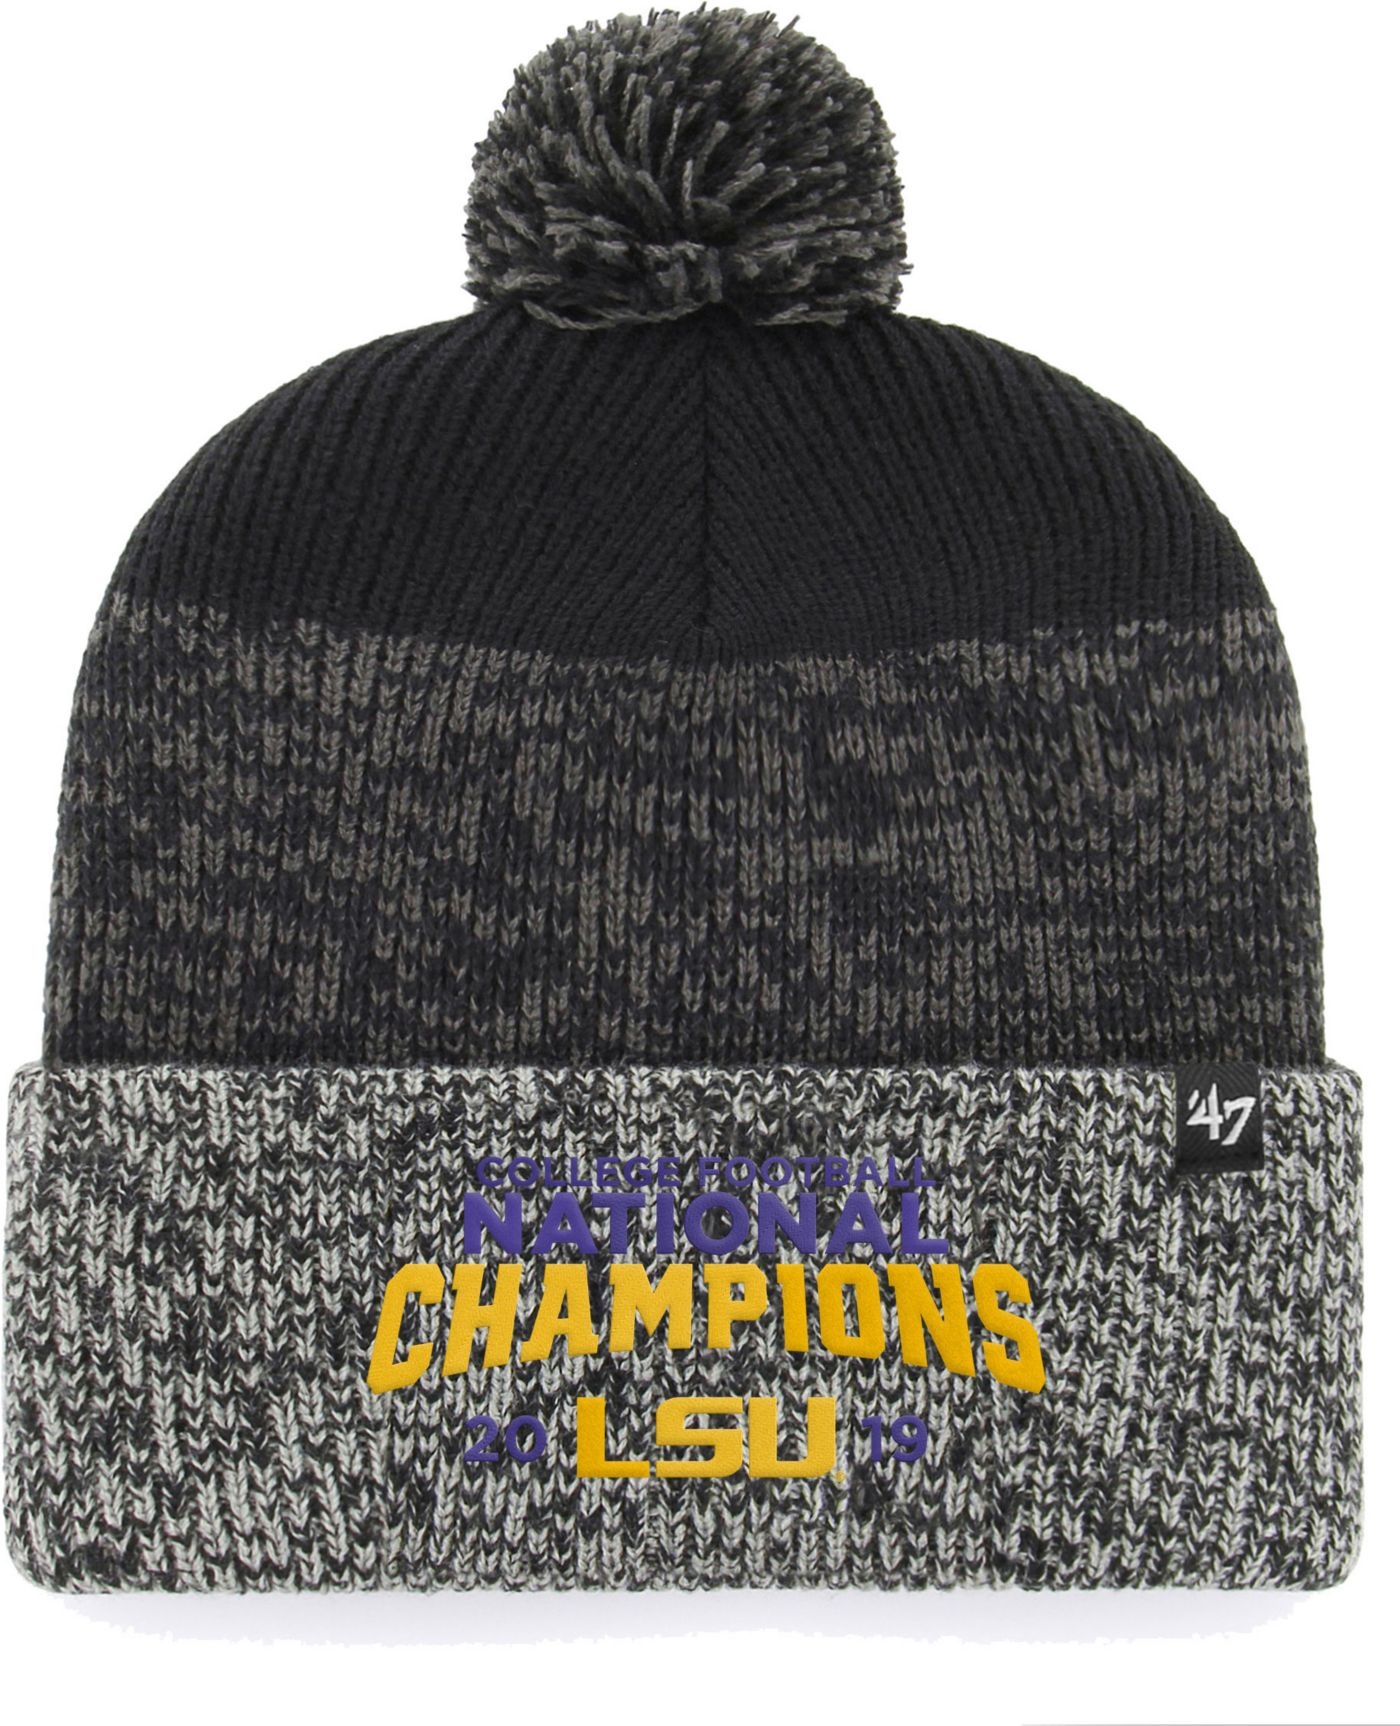 '47 Men's 2019 National Champions LSU Tigers Cuffed Knit Beanie